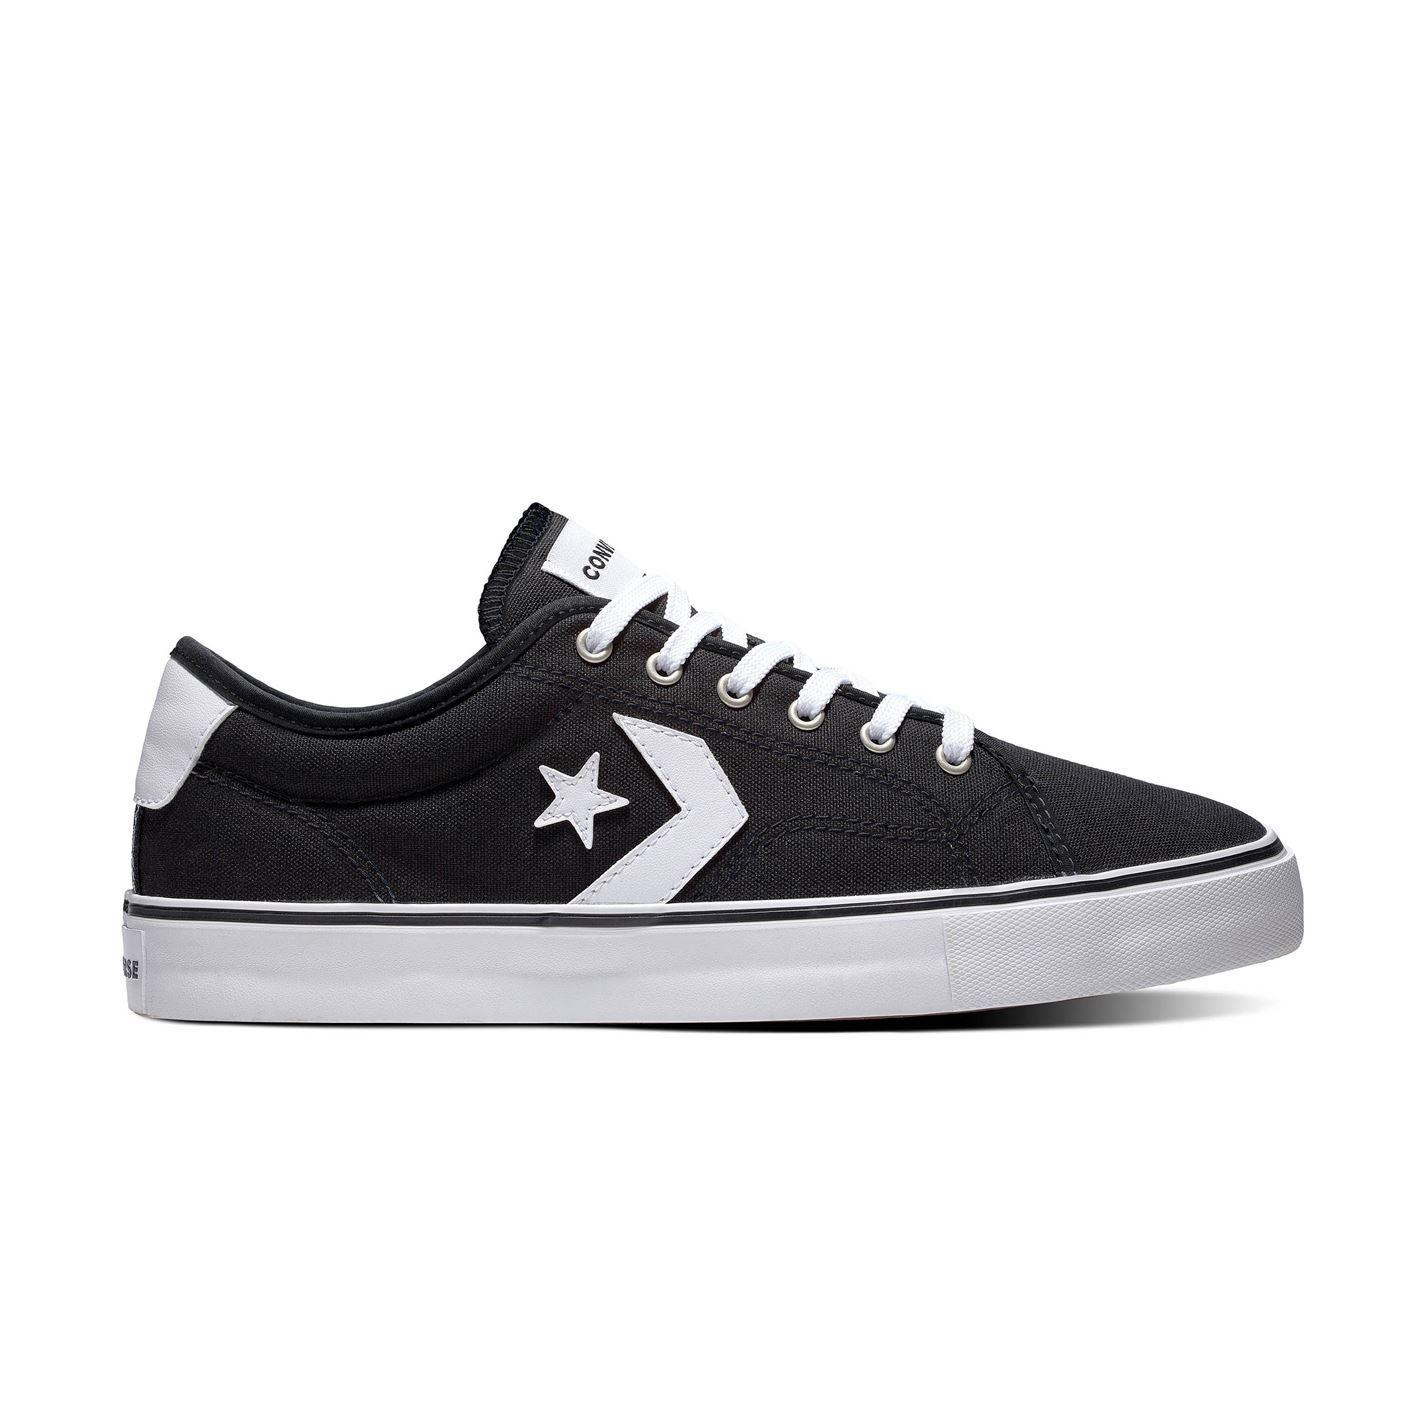 Converse-Ox-REPLAY-Baskets-Pour-Homme-Chaussures-De-Loisirs-Chaussures-Baskets miniature 6